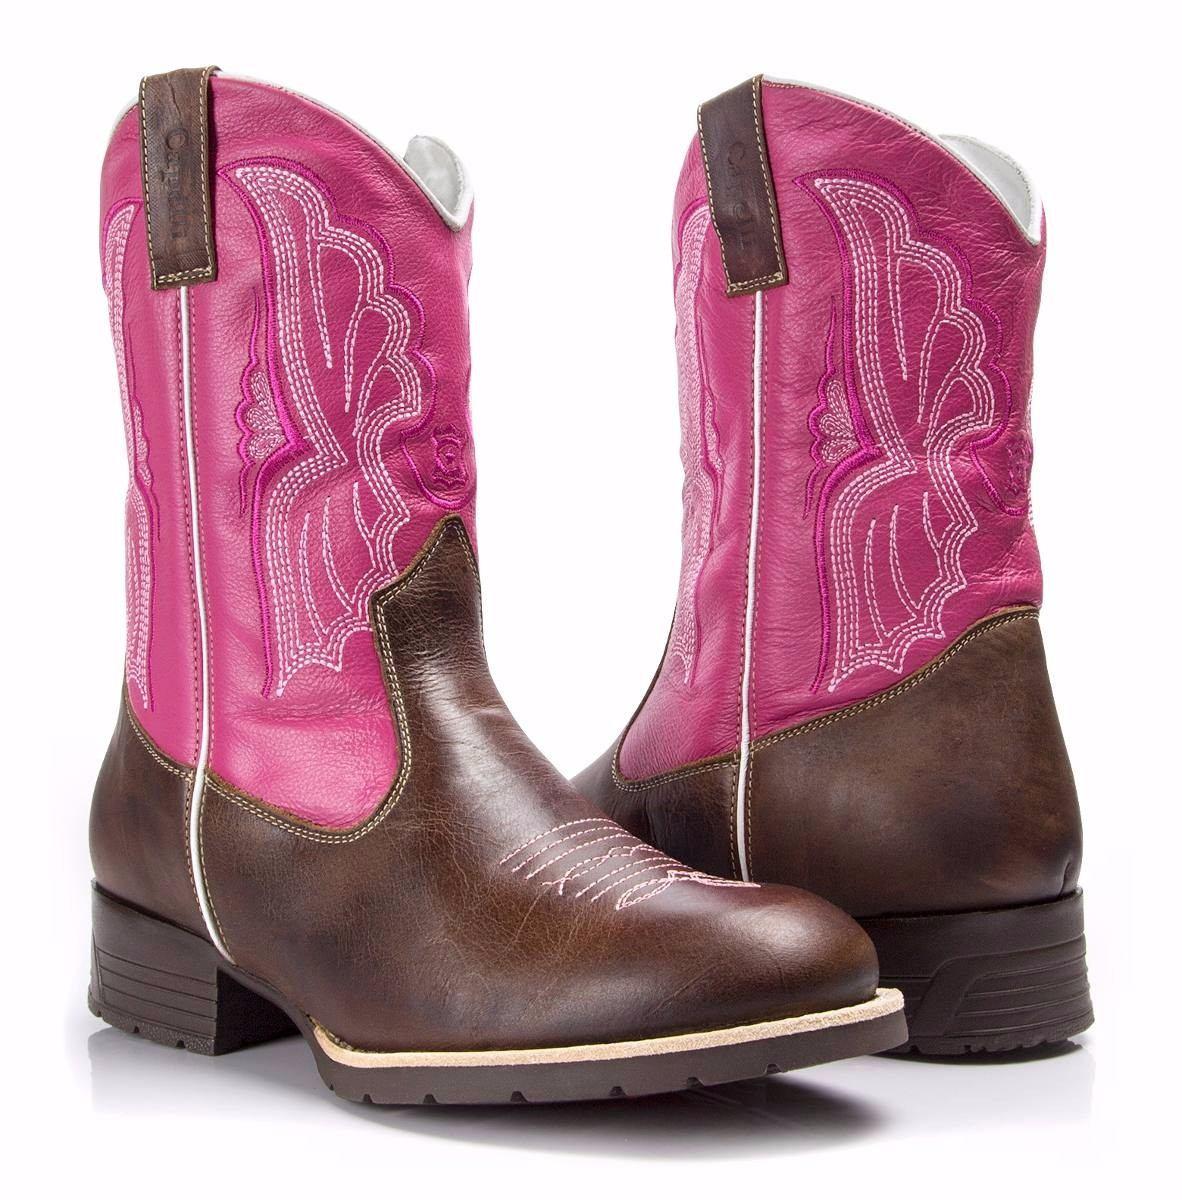 b76c4c2f86 bota texana feminina country montaria western capelli boots. Carregando  zoom.